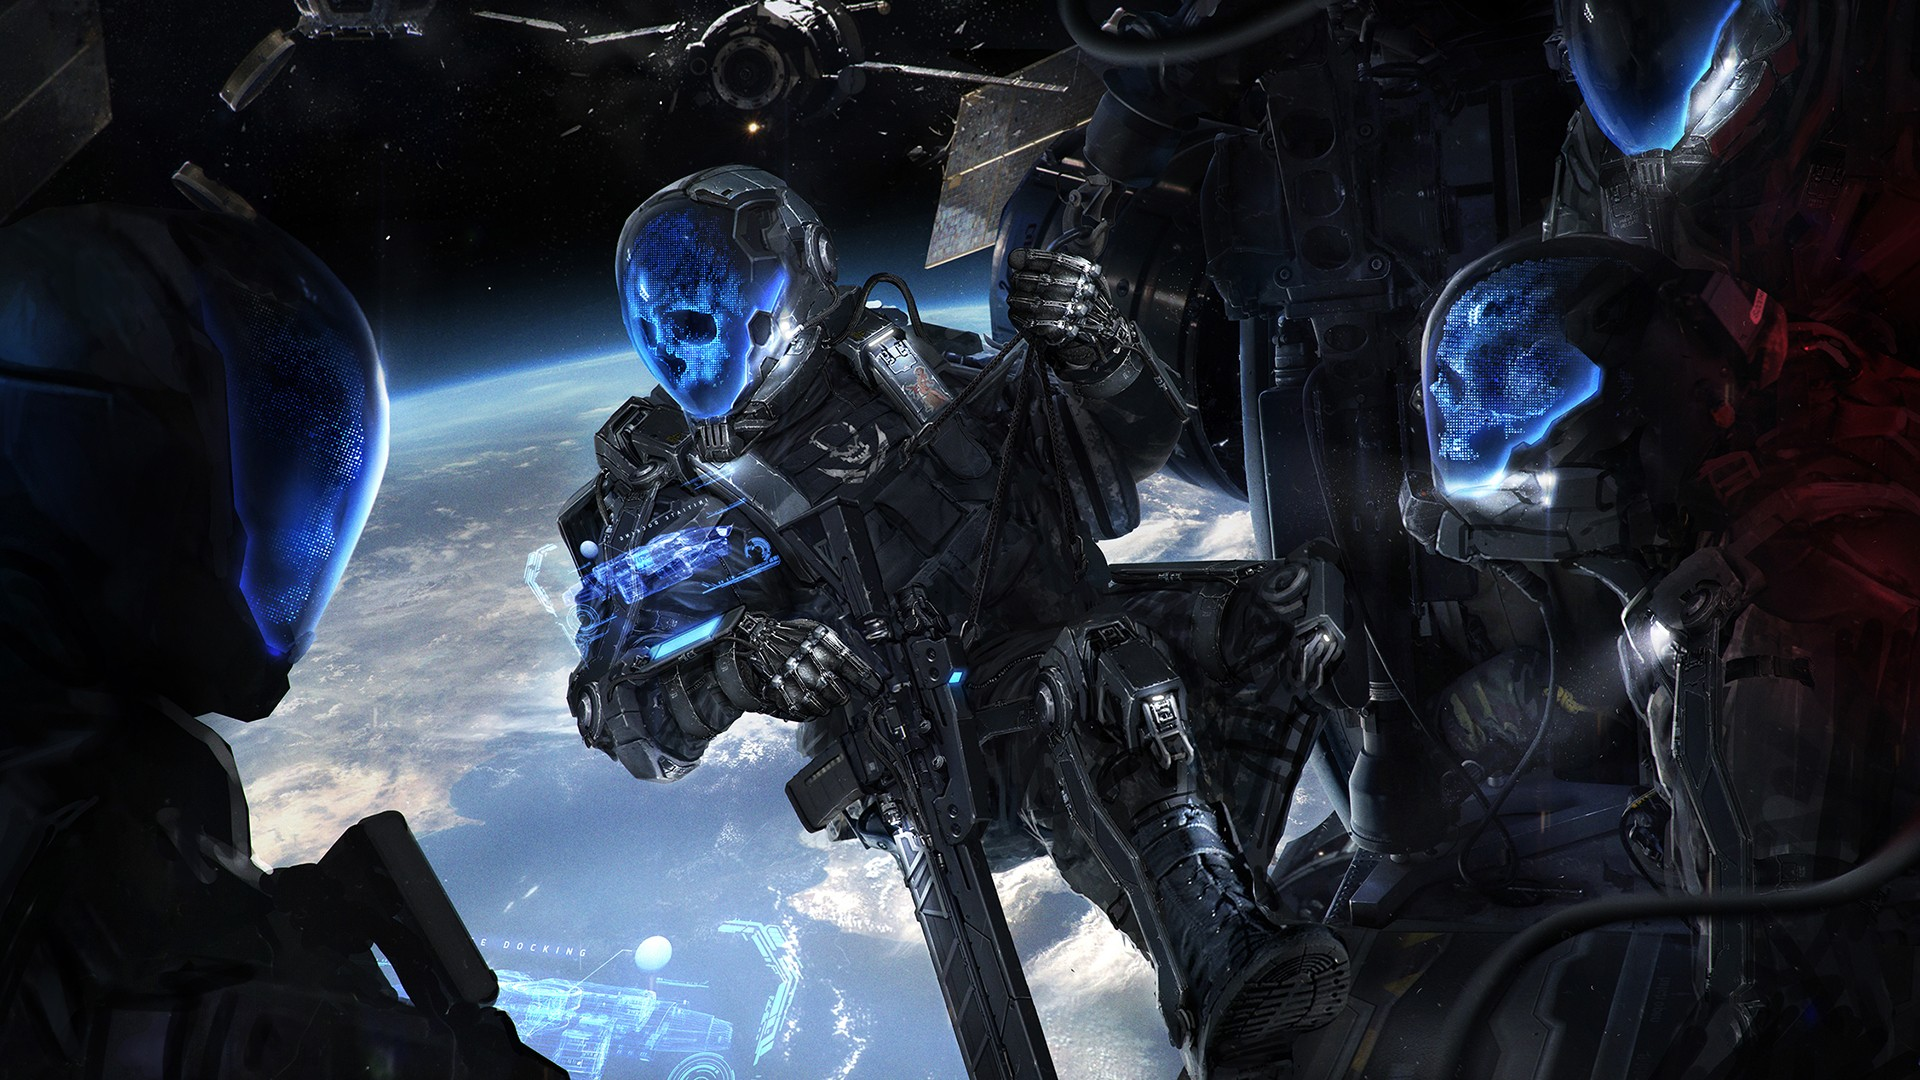 Science Fiction Digital Art Space Military Futuristic